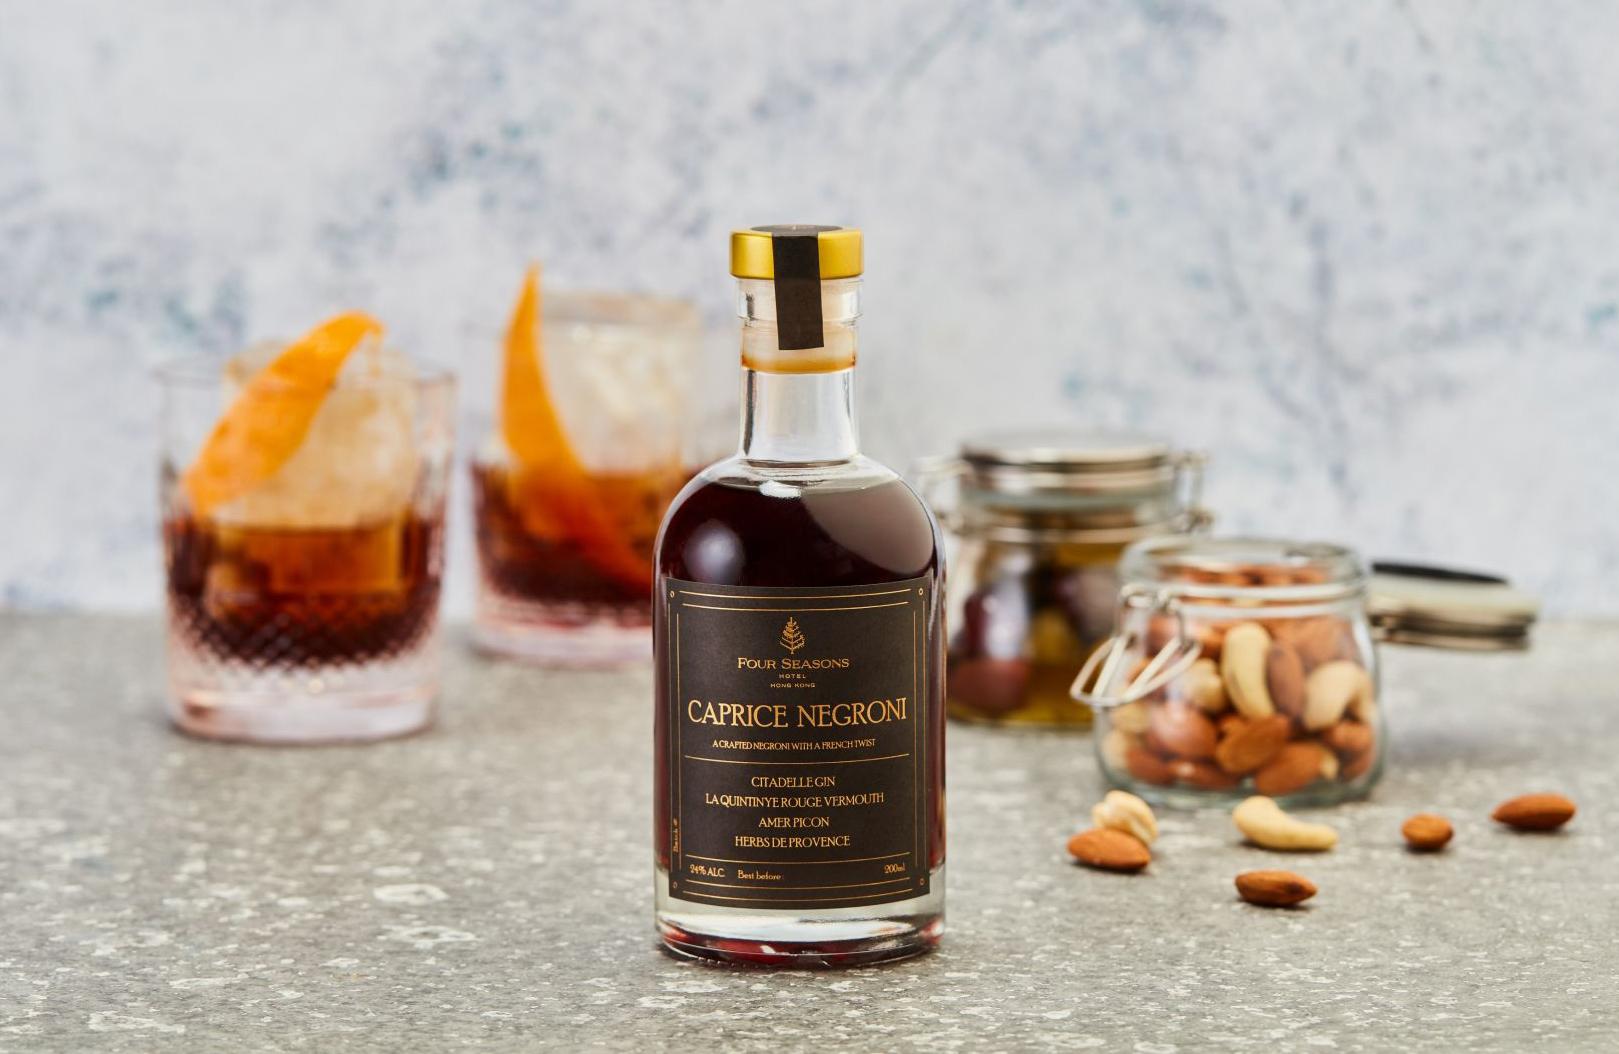 Caprice bottled cocktail